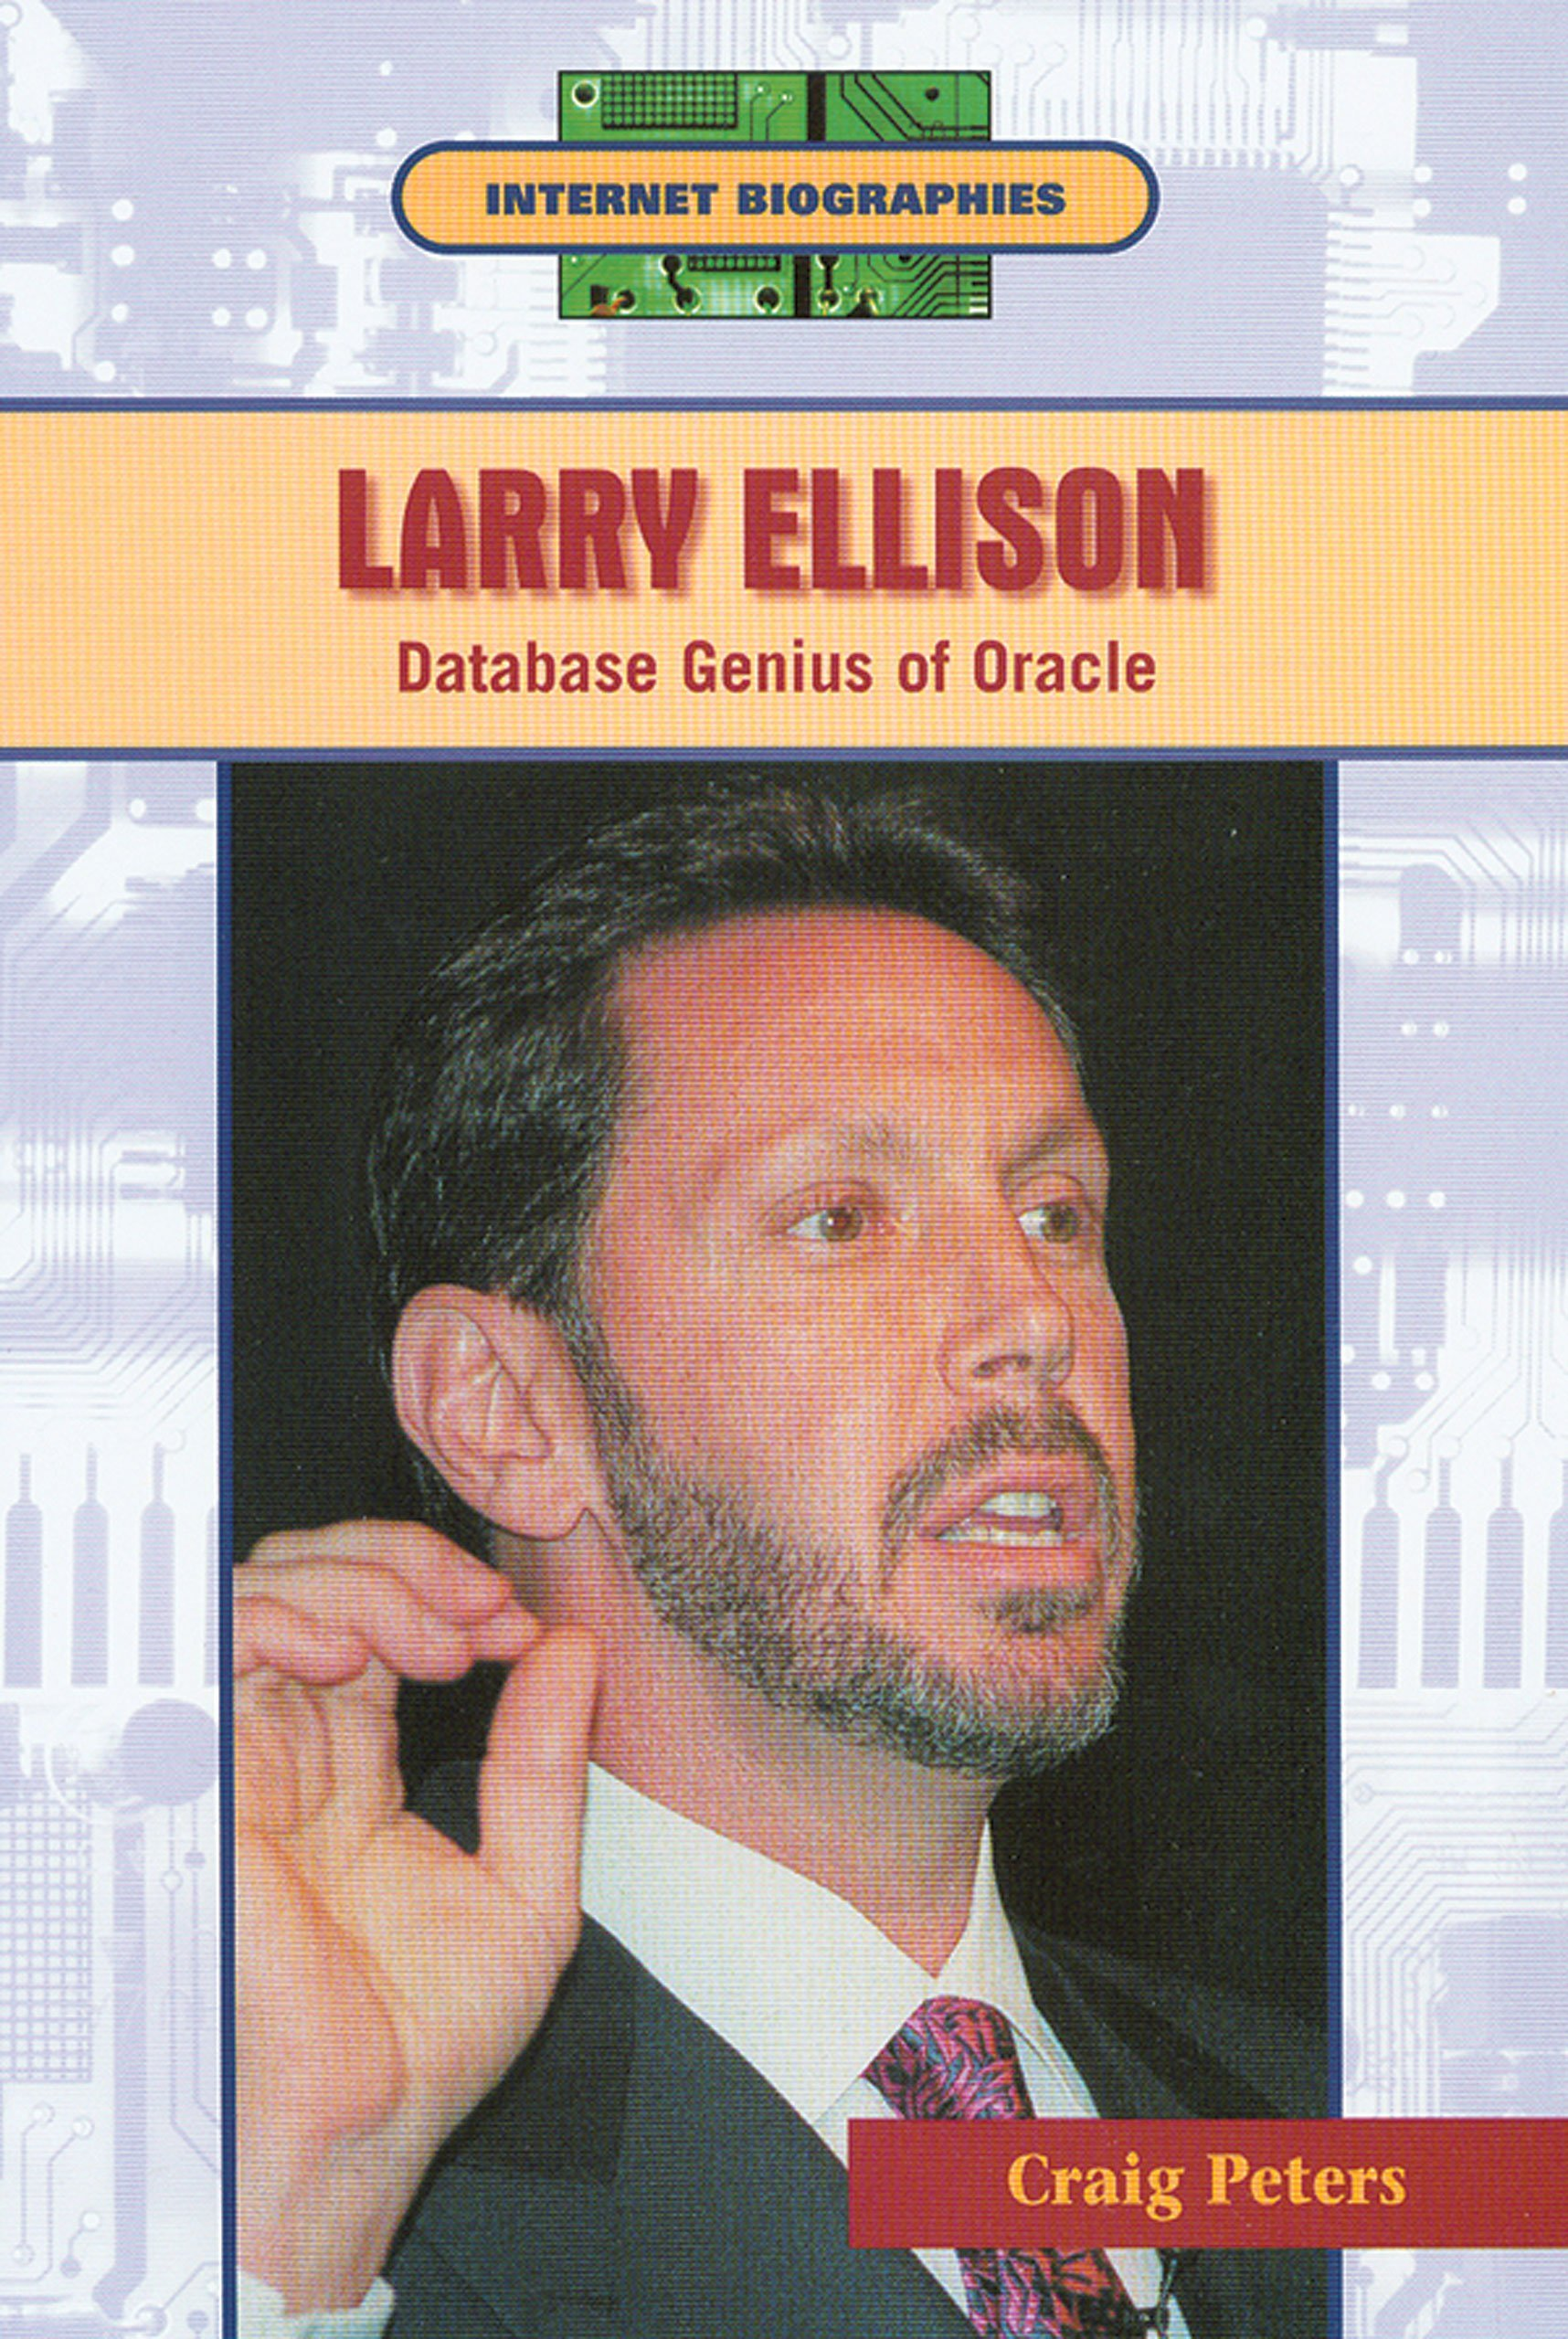 Larry Ellison: Database Genius of Oracle (Internet Biographies)